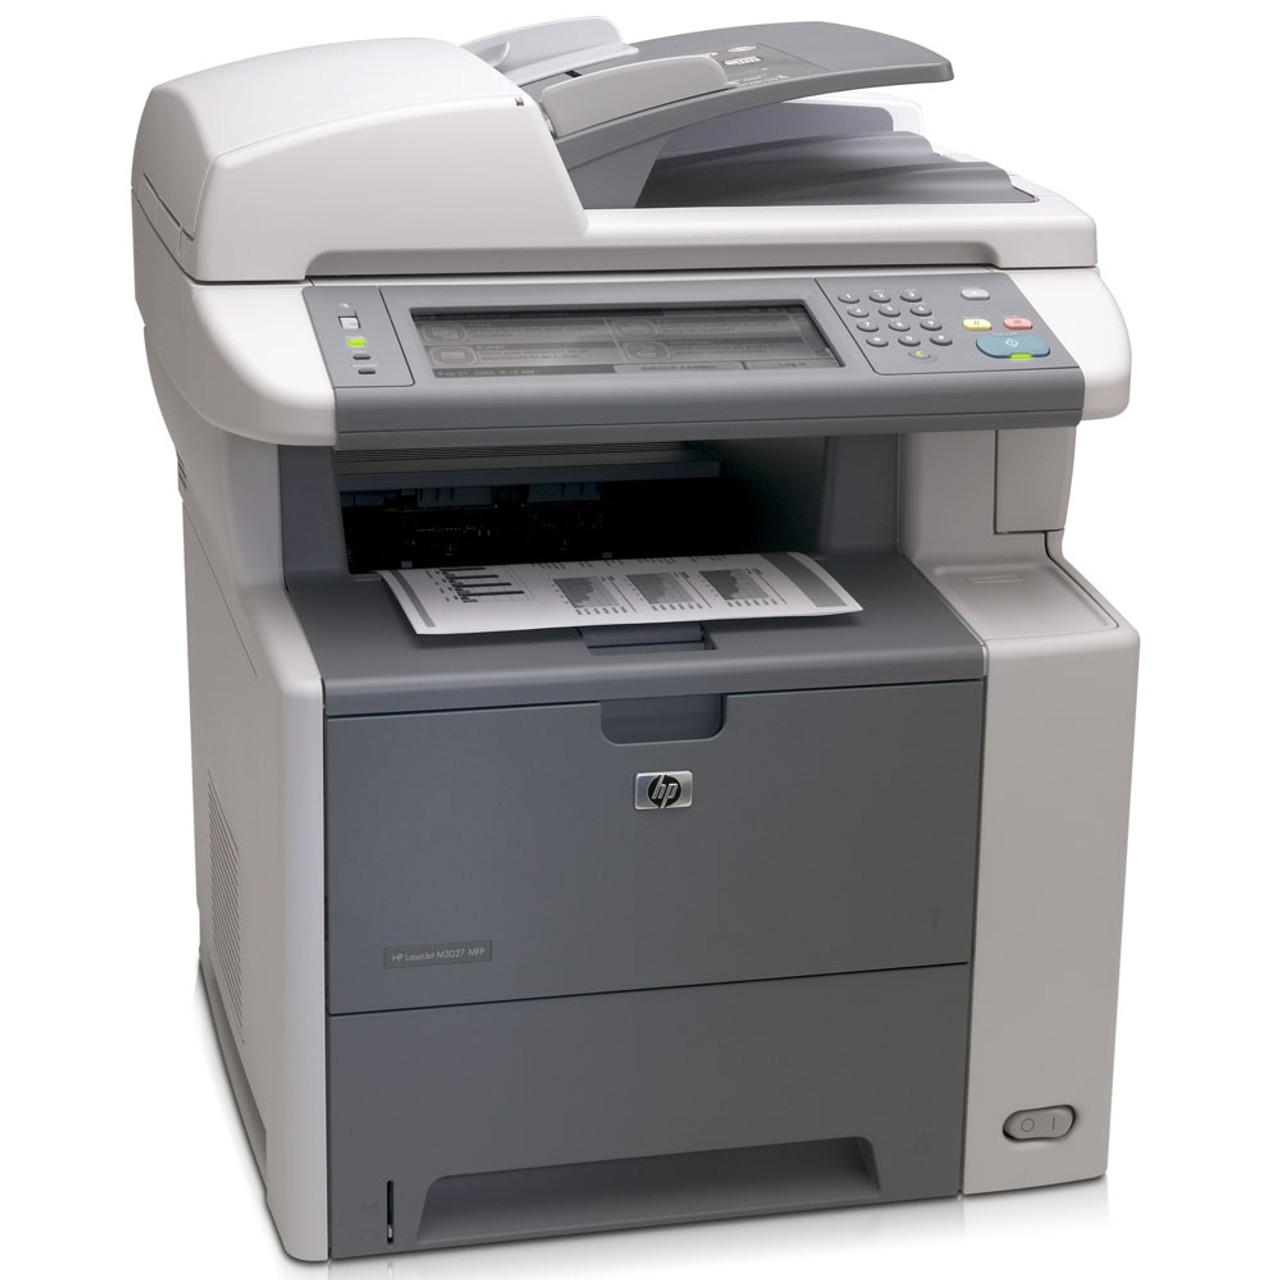 HP LaserJet M3027 - CB416A - HP Laser Printer for sale